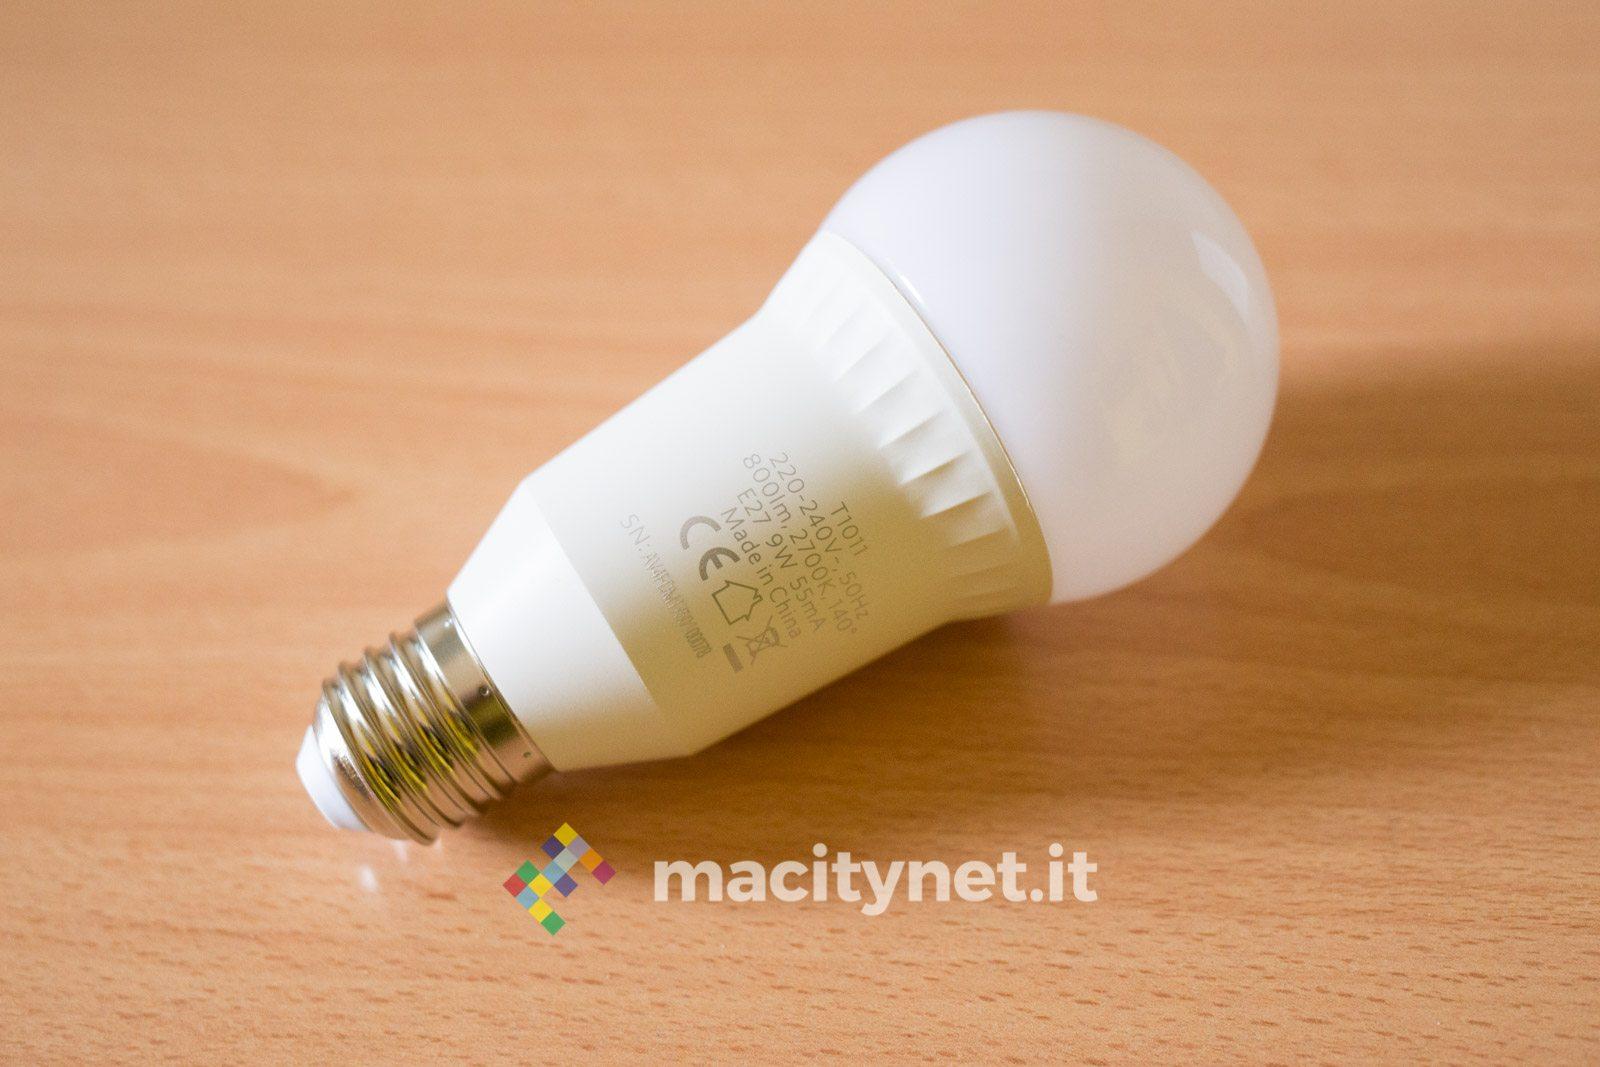 Recensione Eufy Lumos Smart Bulb